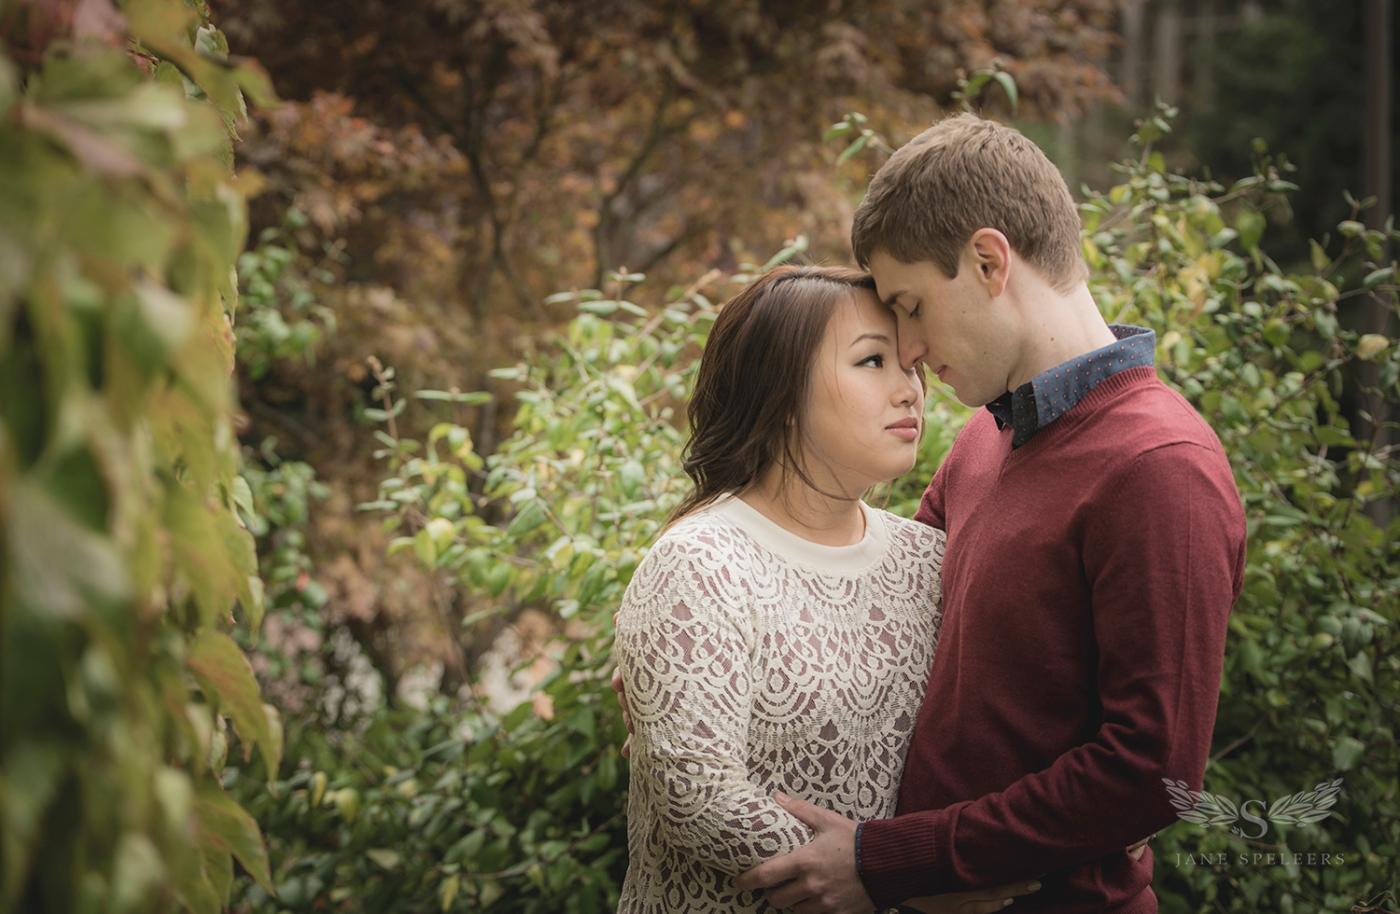 Engagement-UW-Lawcampus_Rebecca_and_Evan DSC_4122